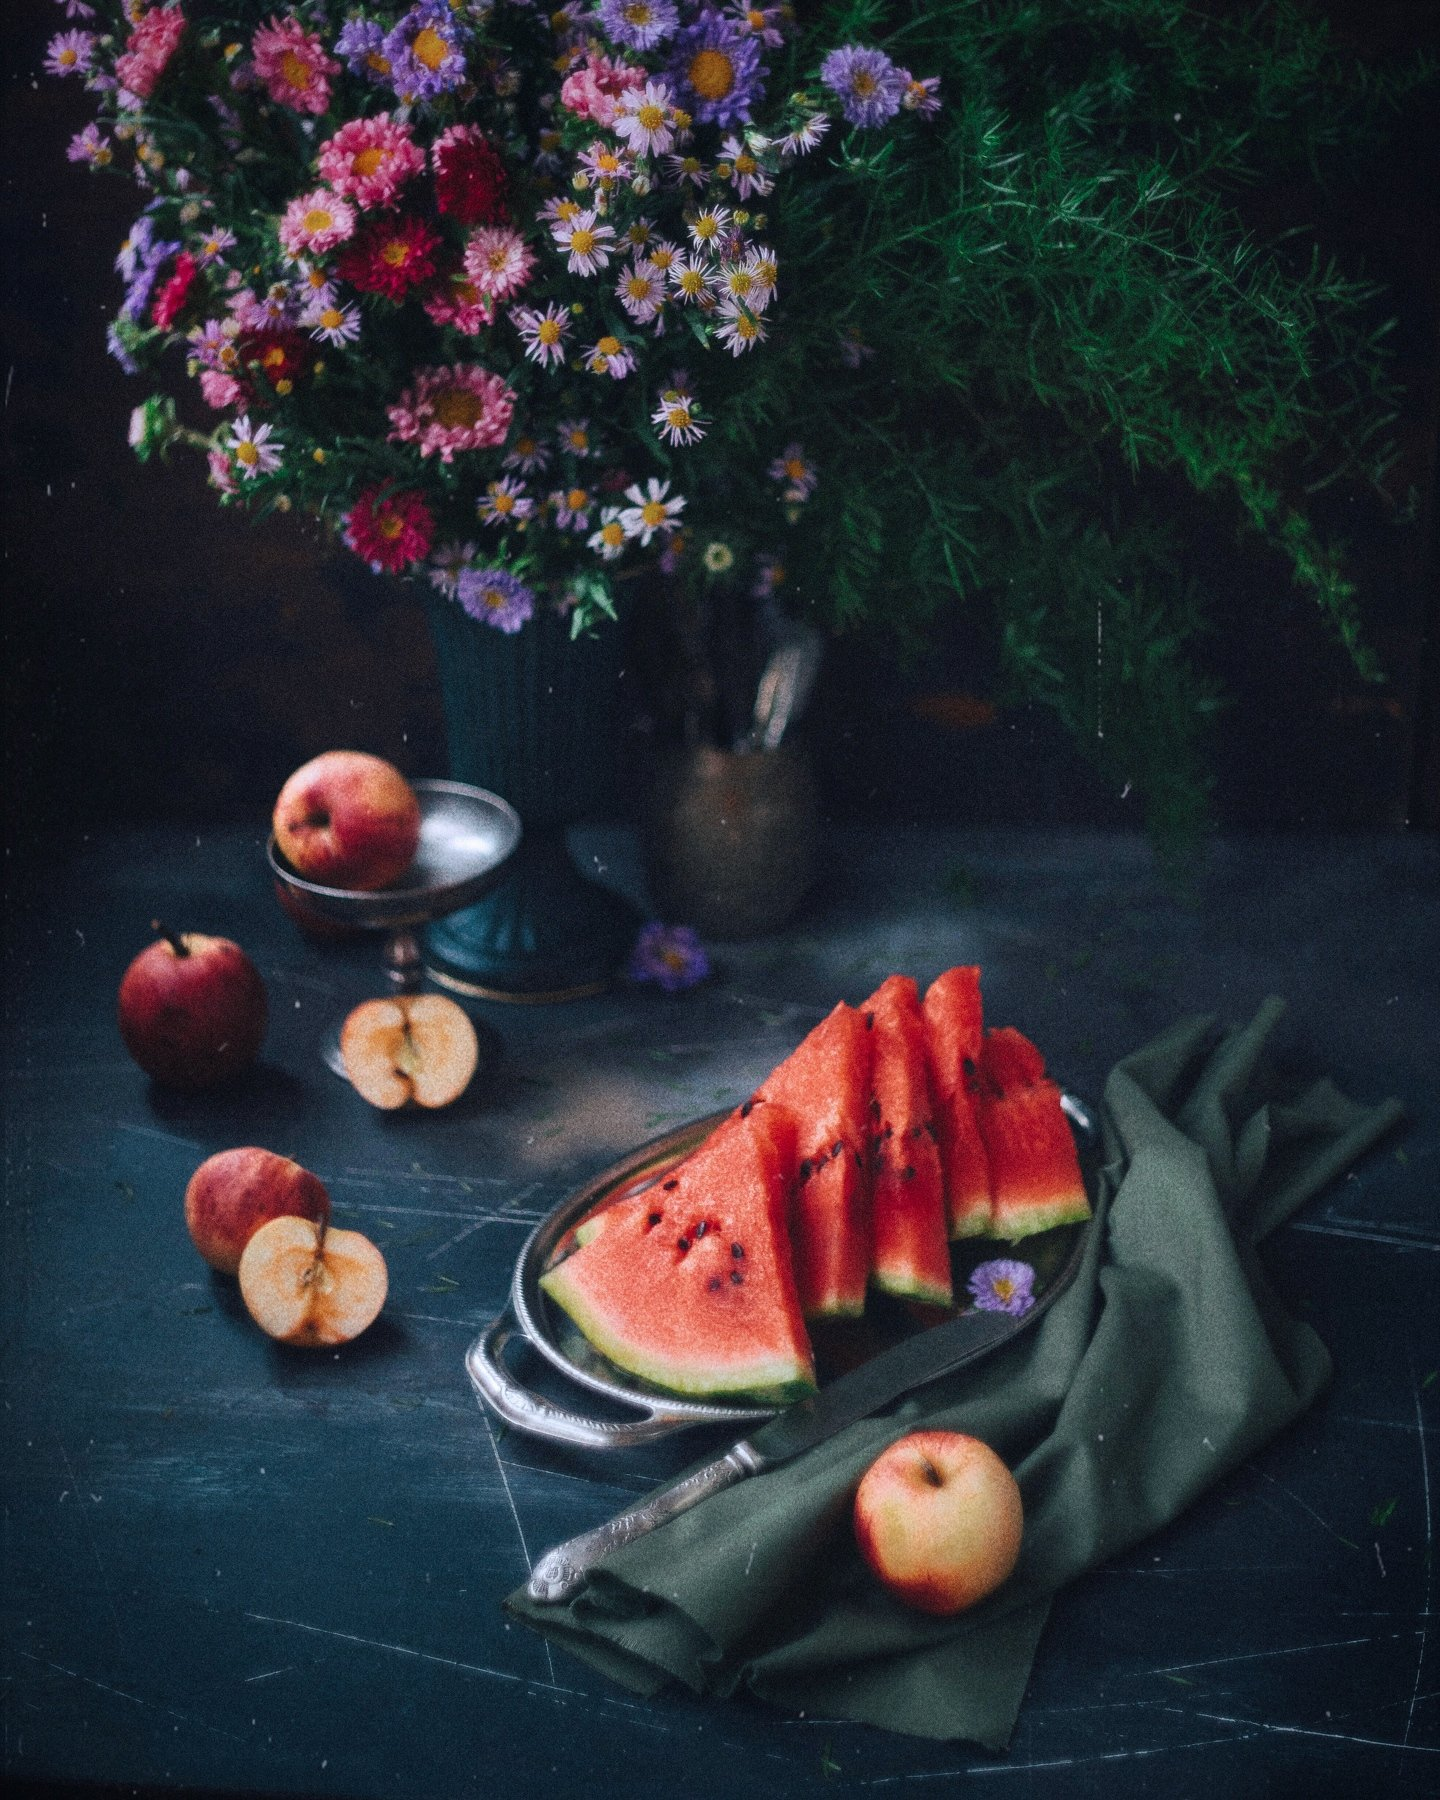 натюрморт, букет, арбуз, яблоки, цвет, Зубкова Анастасия